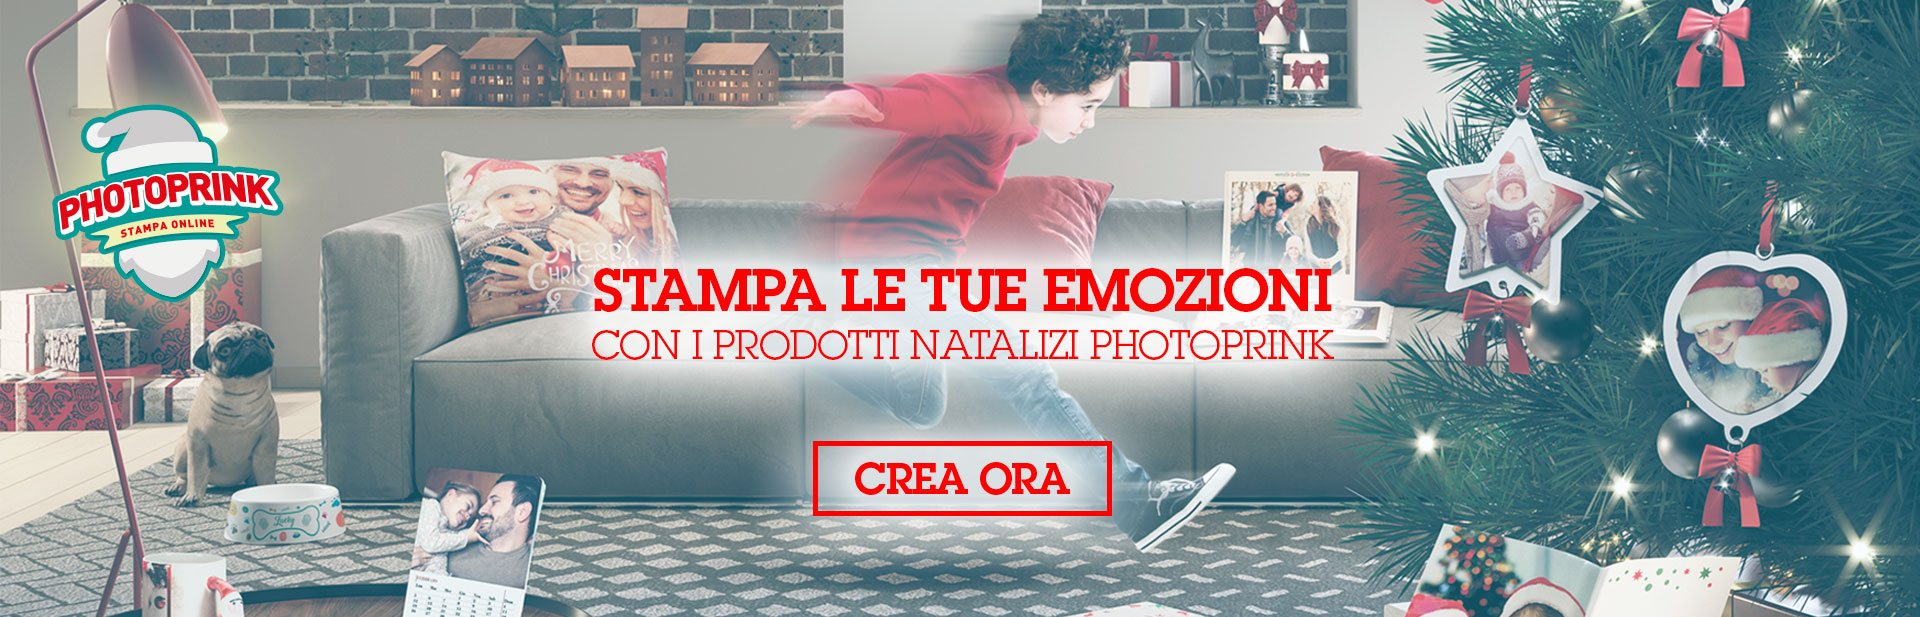 regali-personalizzati-stampa-digitale-natale-photoprink-SL